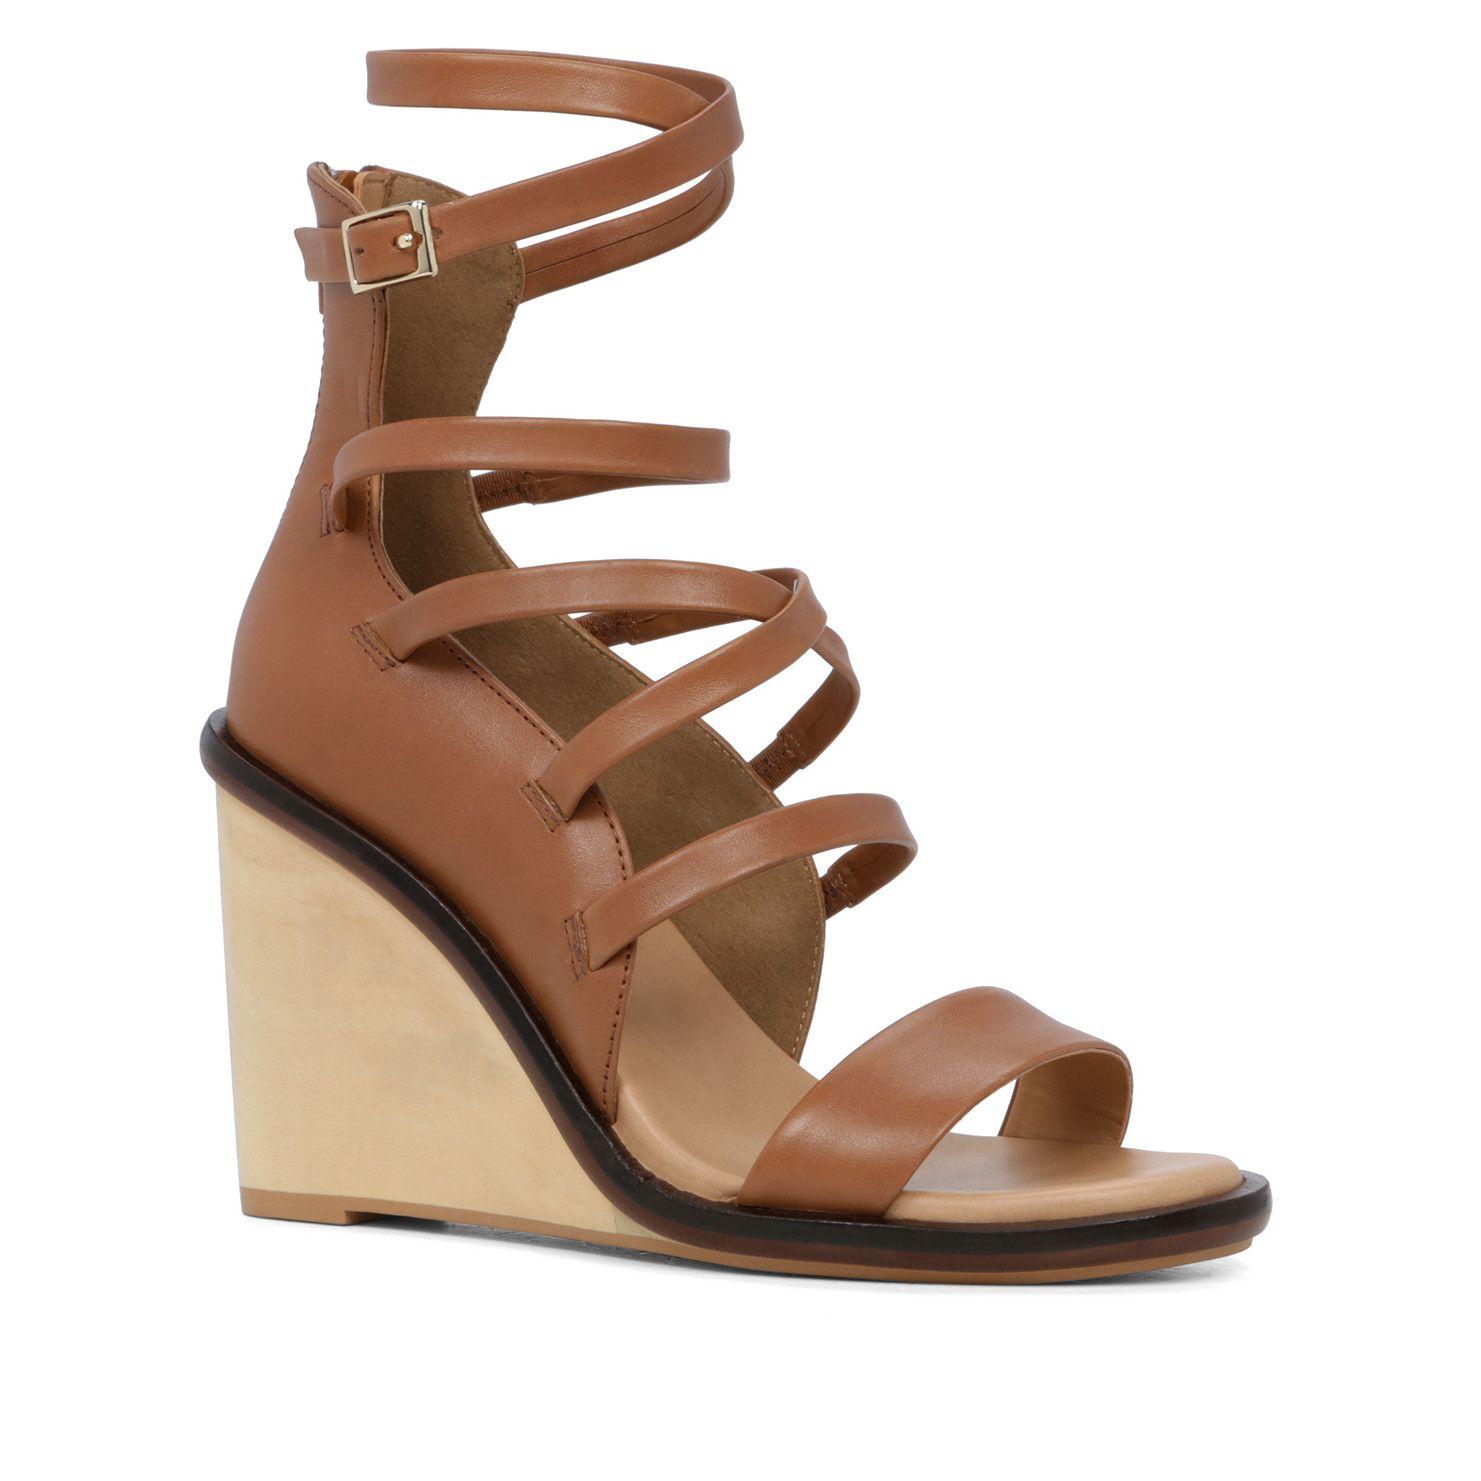 Womens sandals wedges - Russella Wedge Sandals Women S Sandals Aldoshoes Com